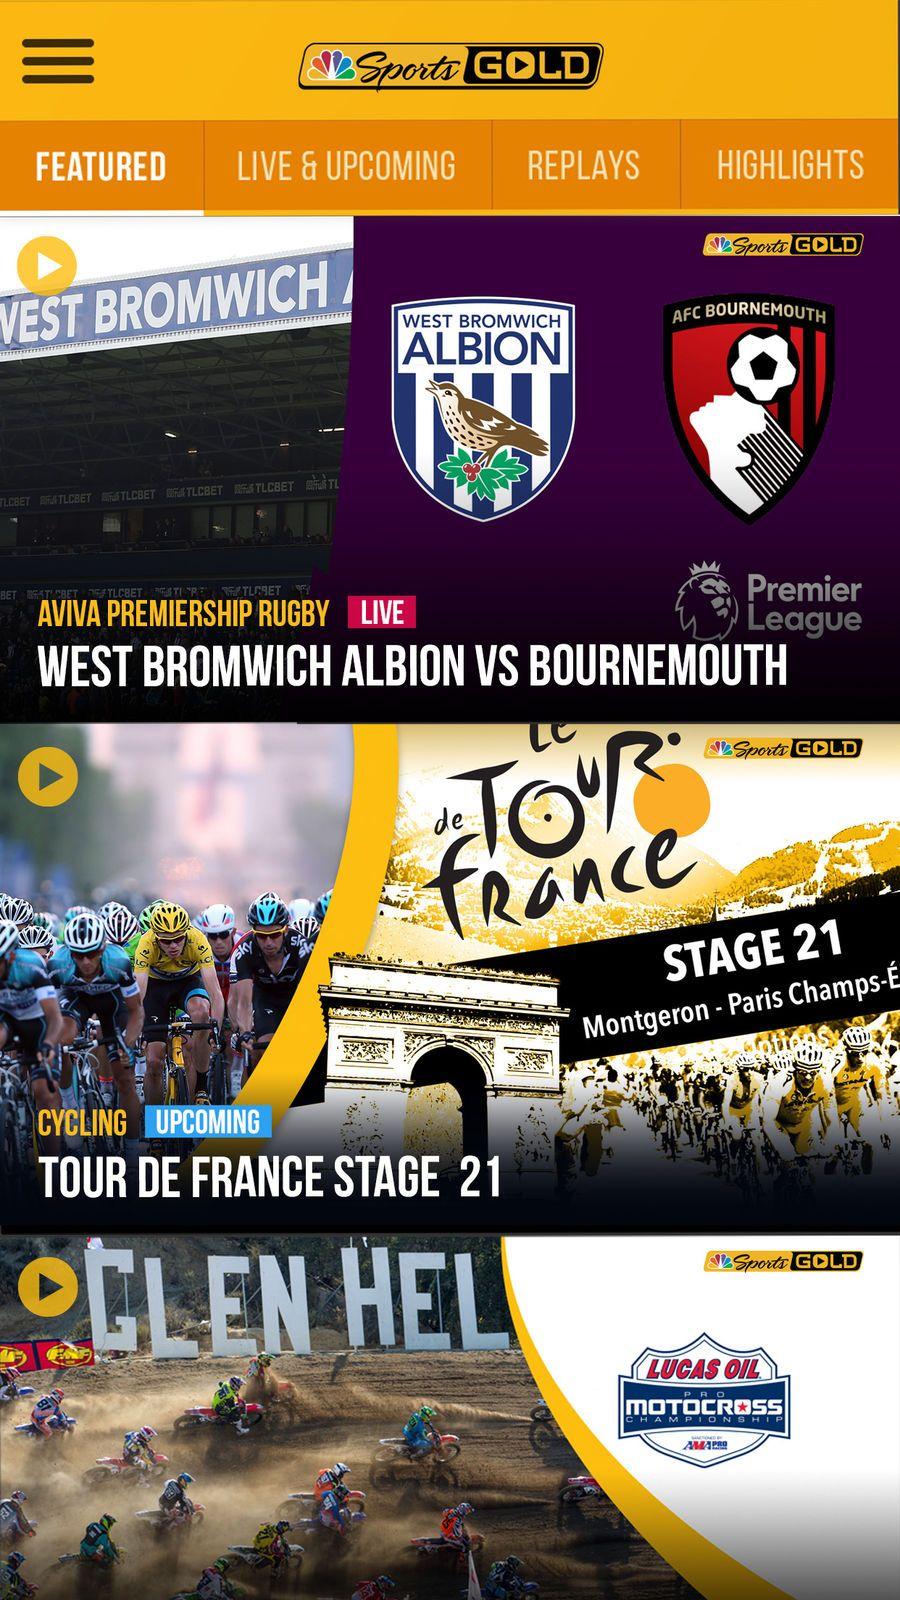 Nbc Sports Gold Entertainment Llc Apps Ios Nbc Sports West Bromwich